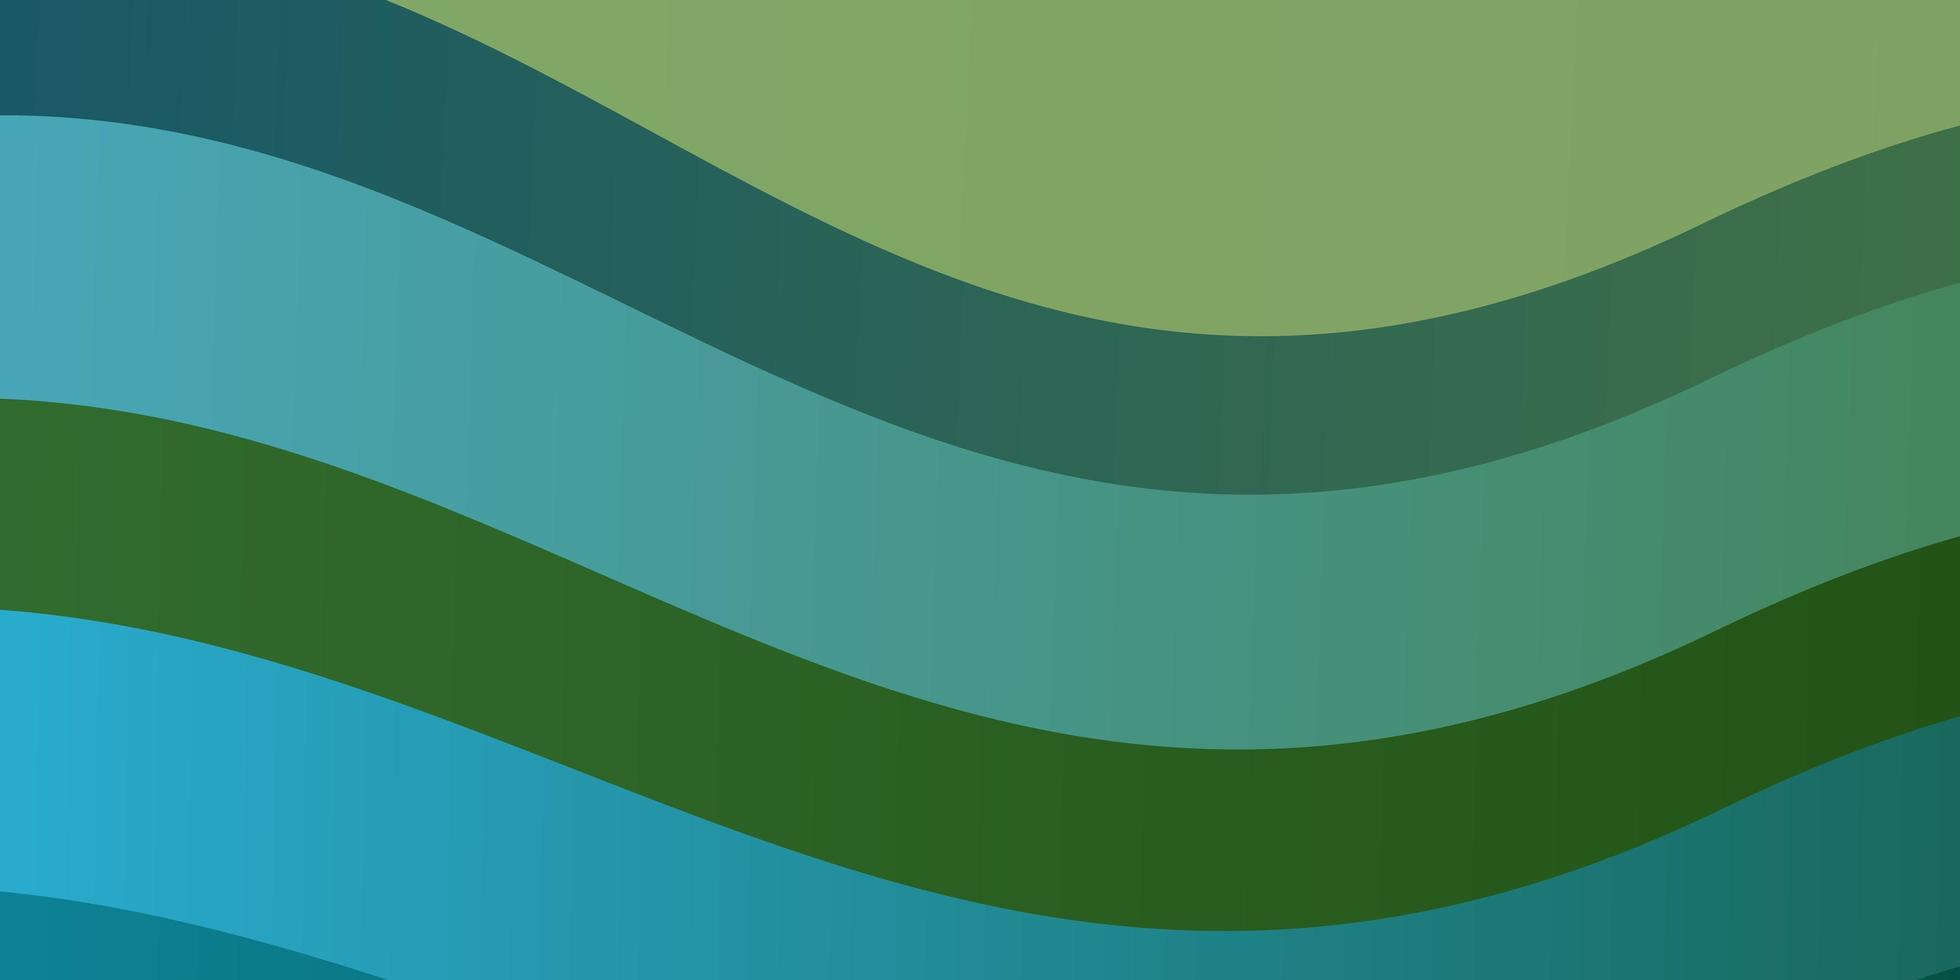 diseño de vector azul claro, verde con líneas torcidas.